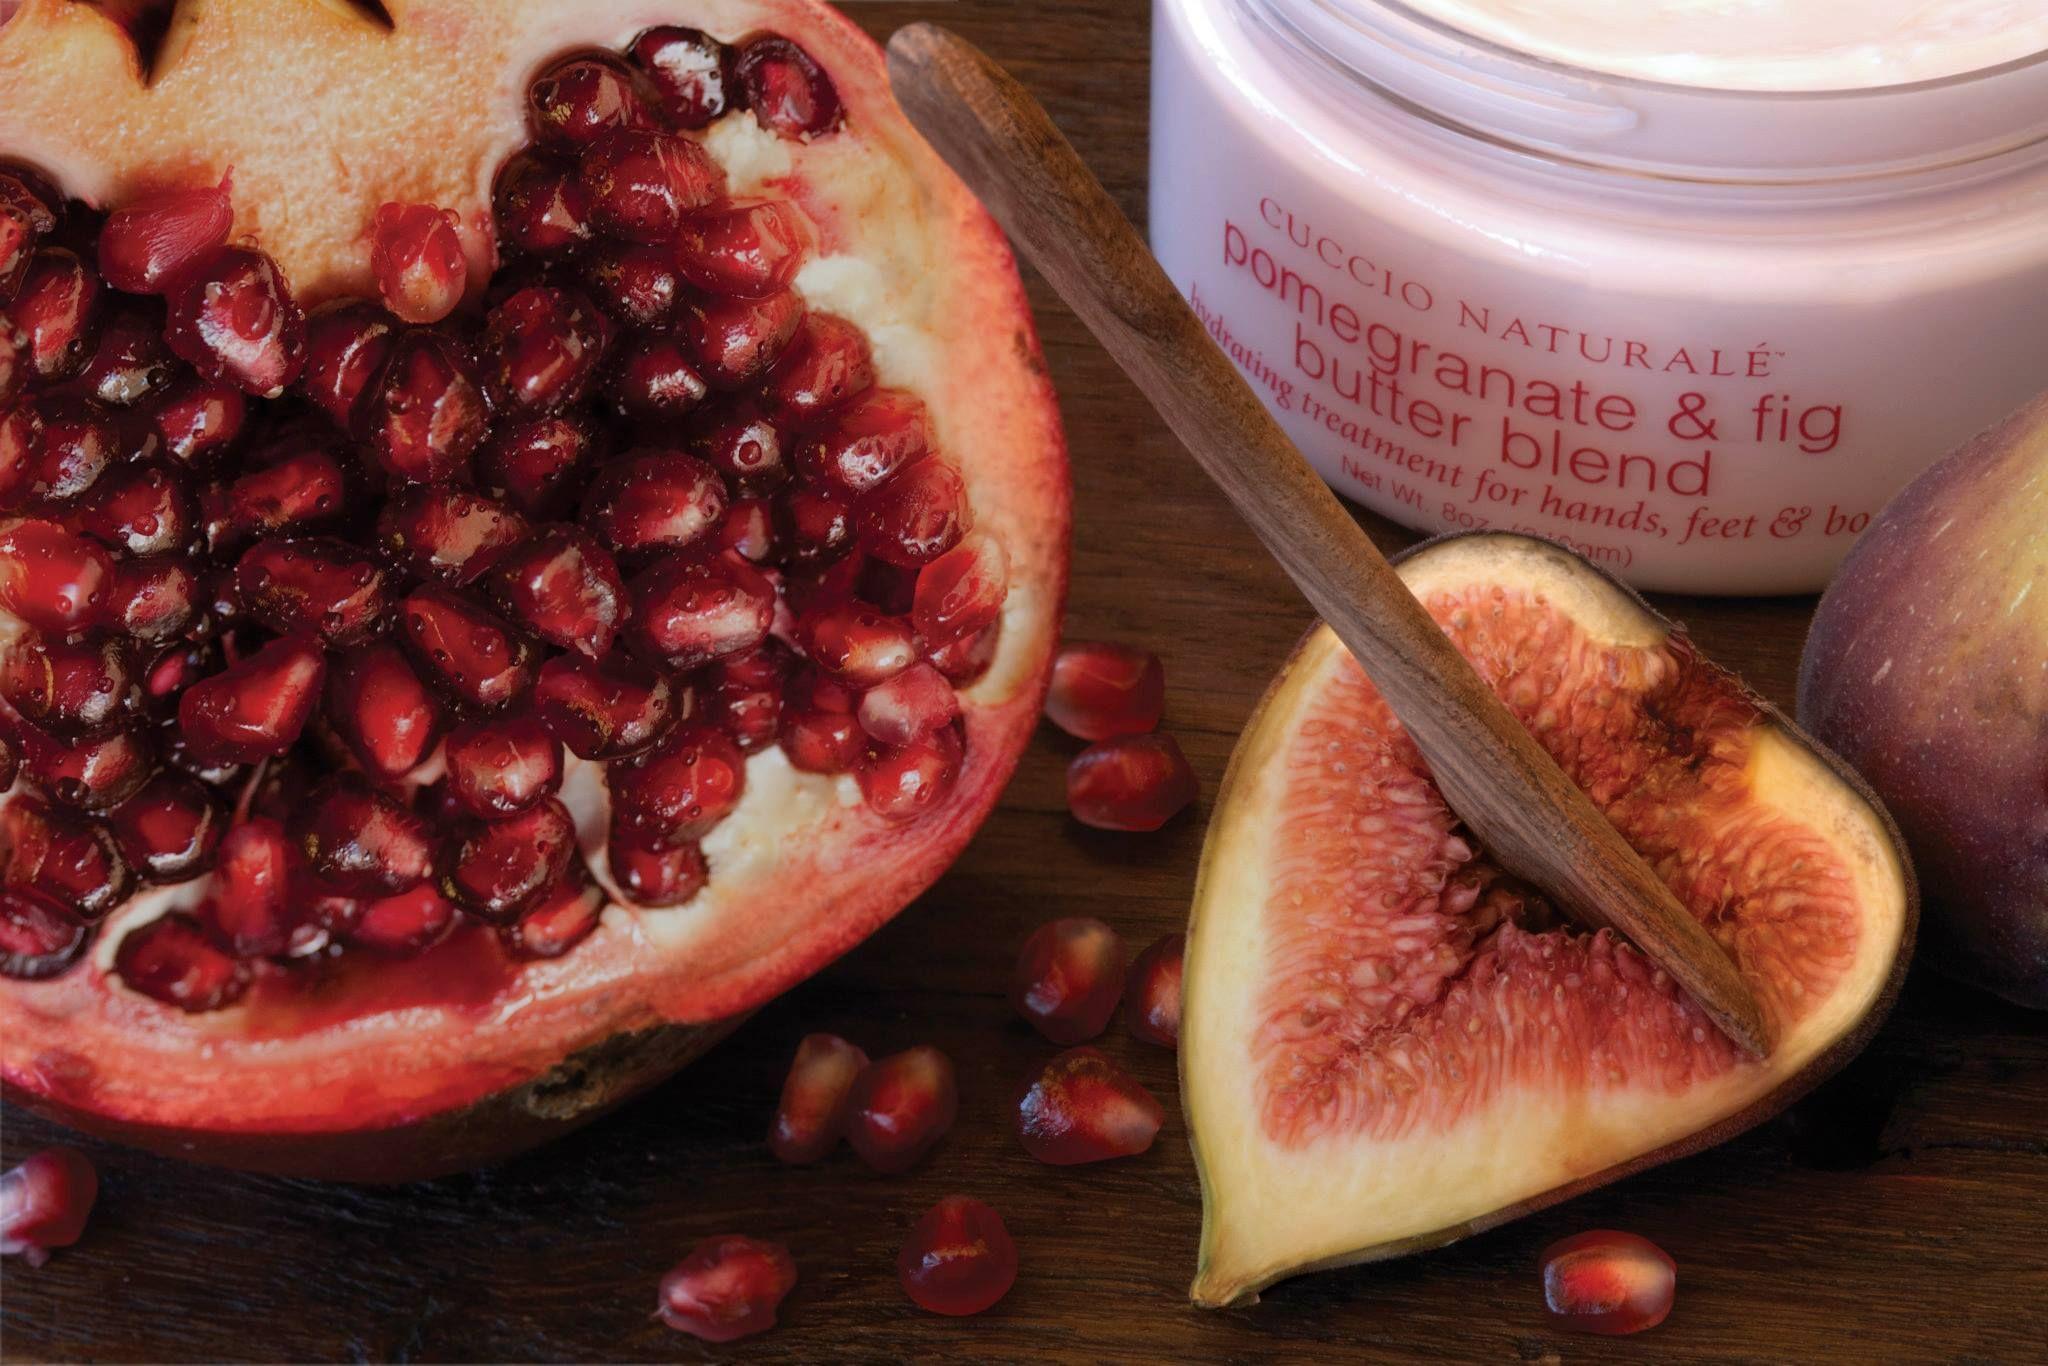 pomegranate&fig | Food, Pomegranate, Fig